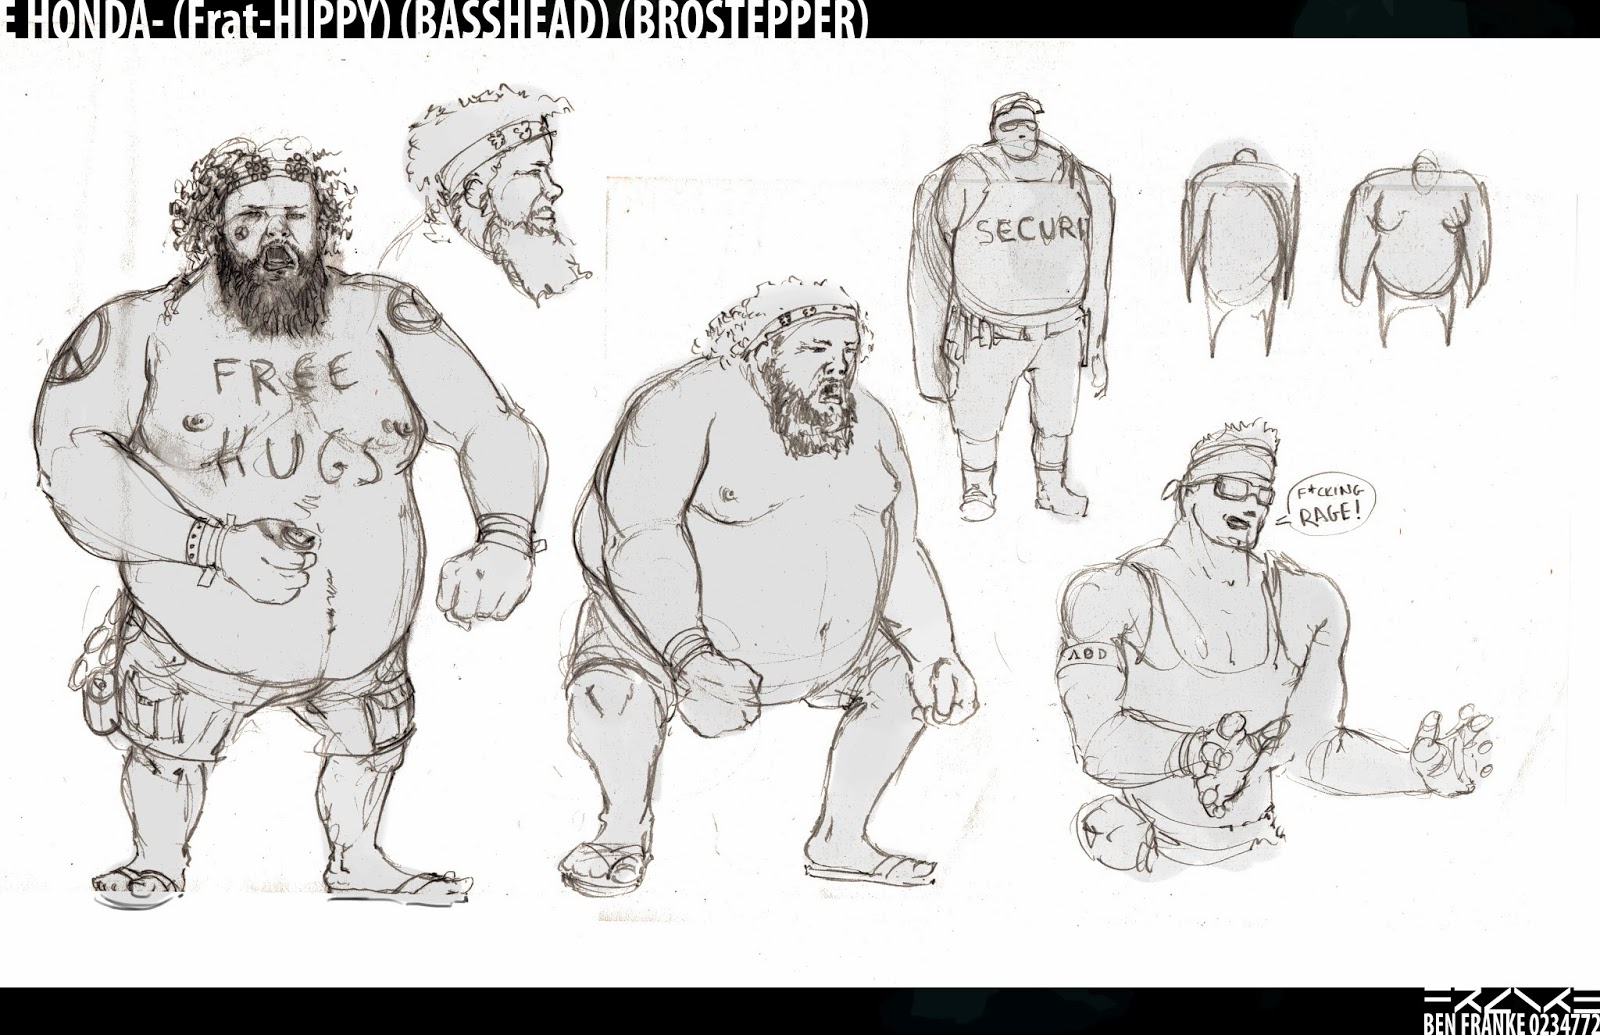 Character Design 1 - Street Fighter Redesign - Festival